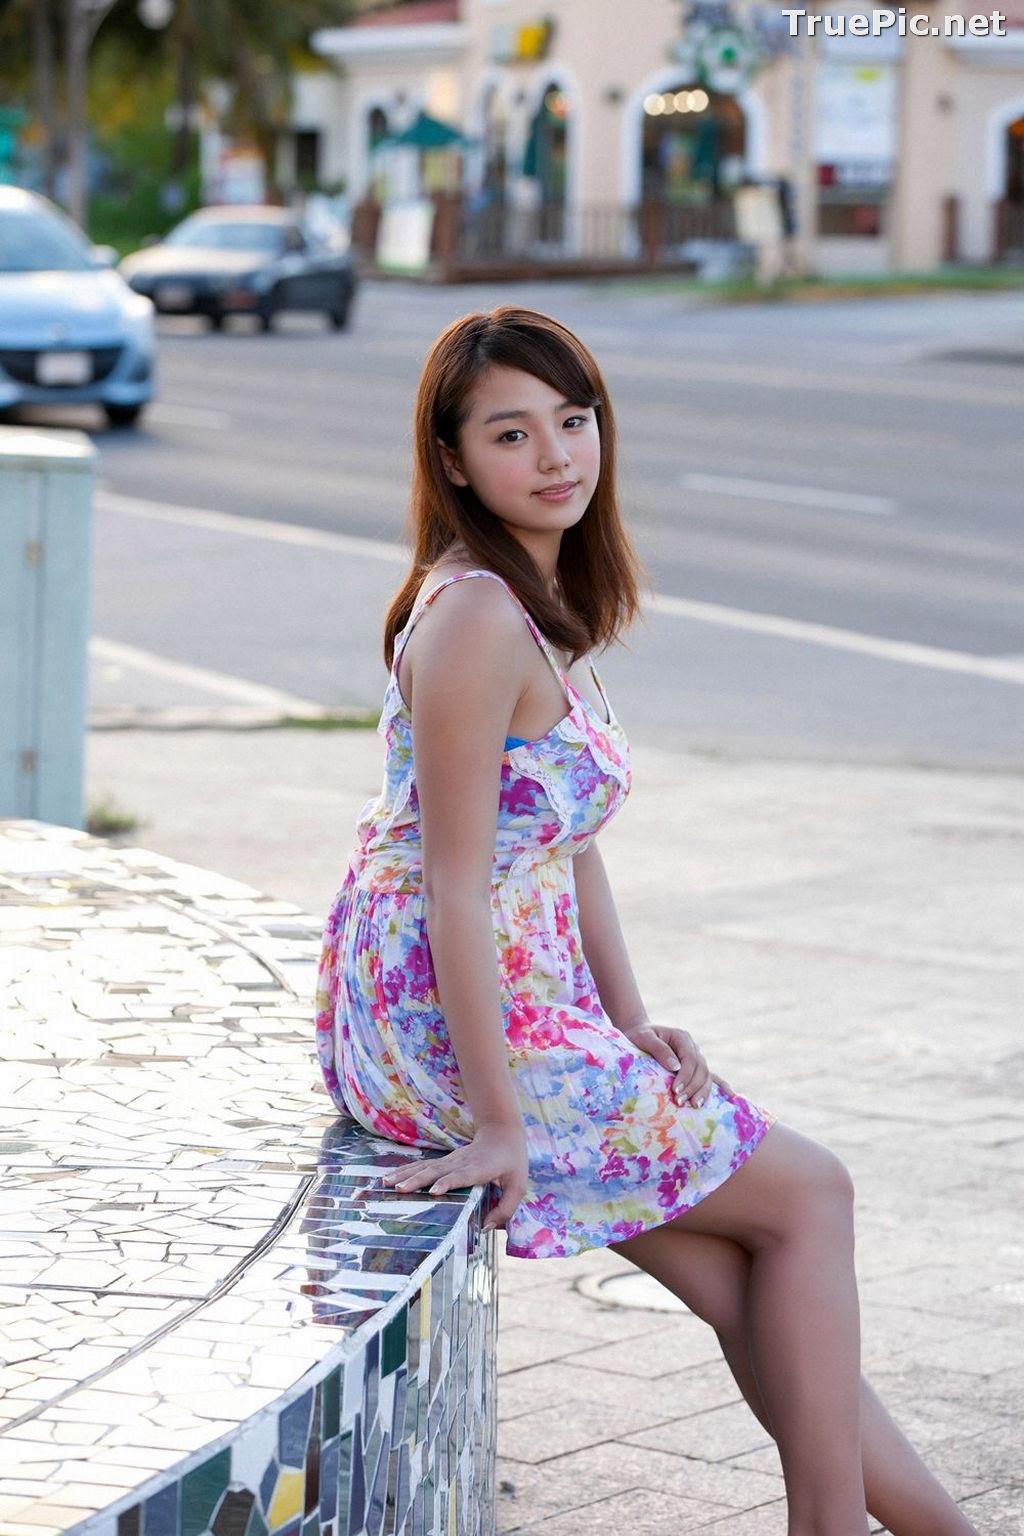 Image [YS Web] Vol.465 – Japanese Model Ai Shinozaki – Mermaid of Love Photo Album - TruePic.net - Picture-1